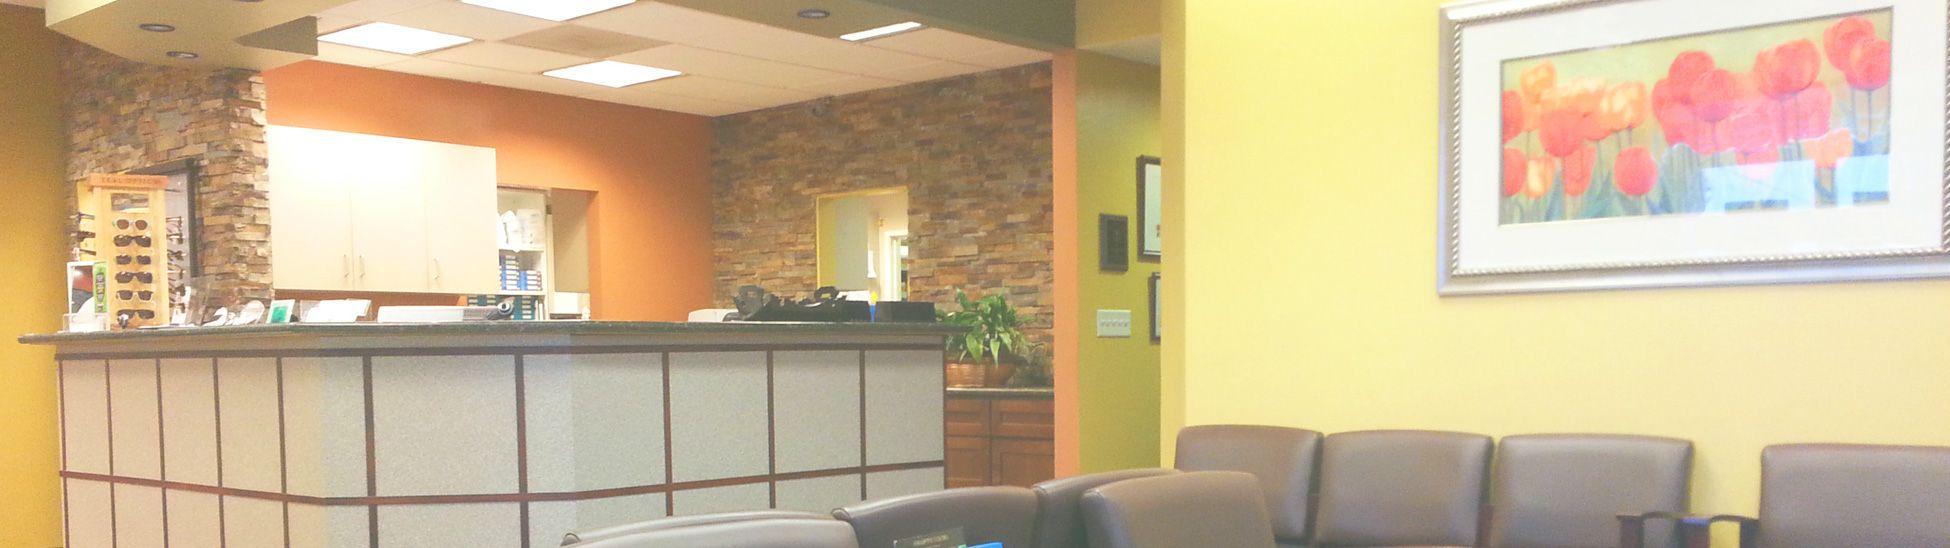 Whittier optometry office panorama